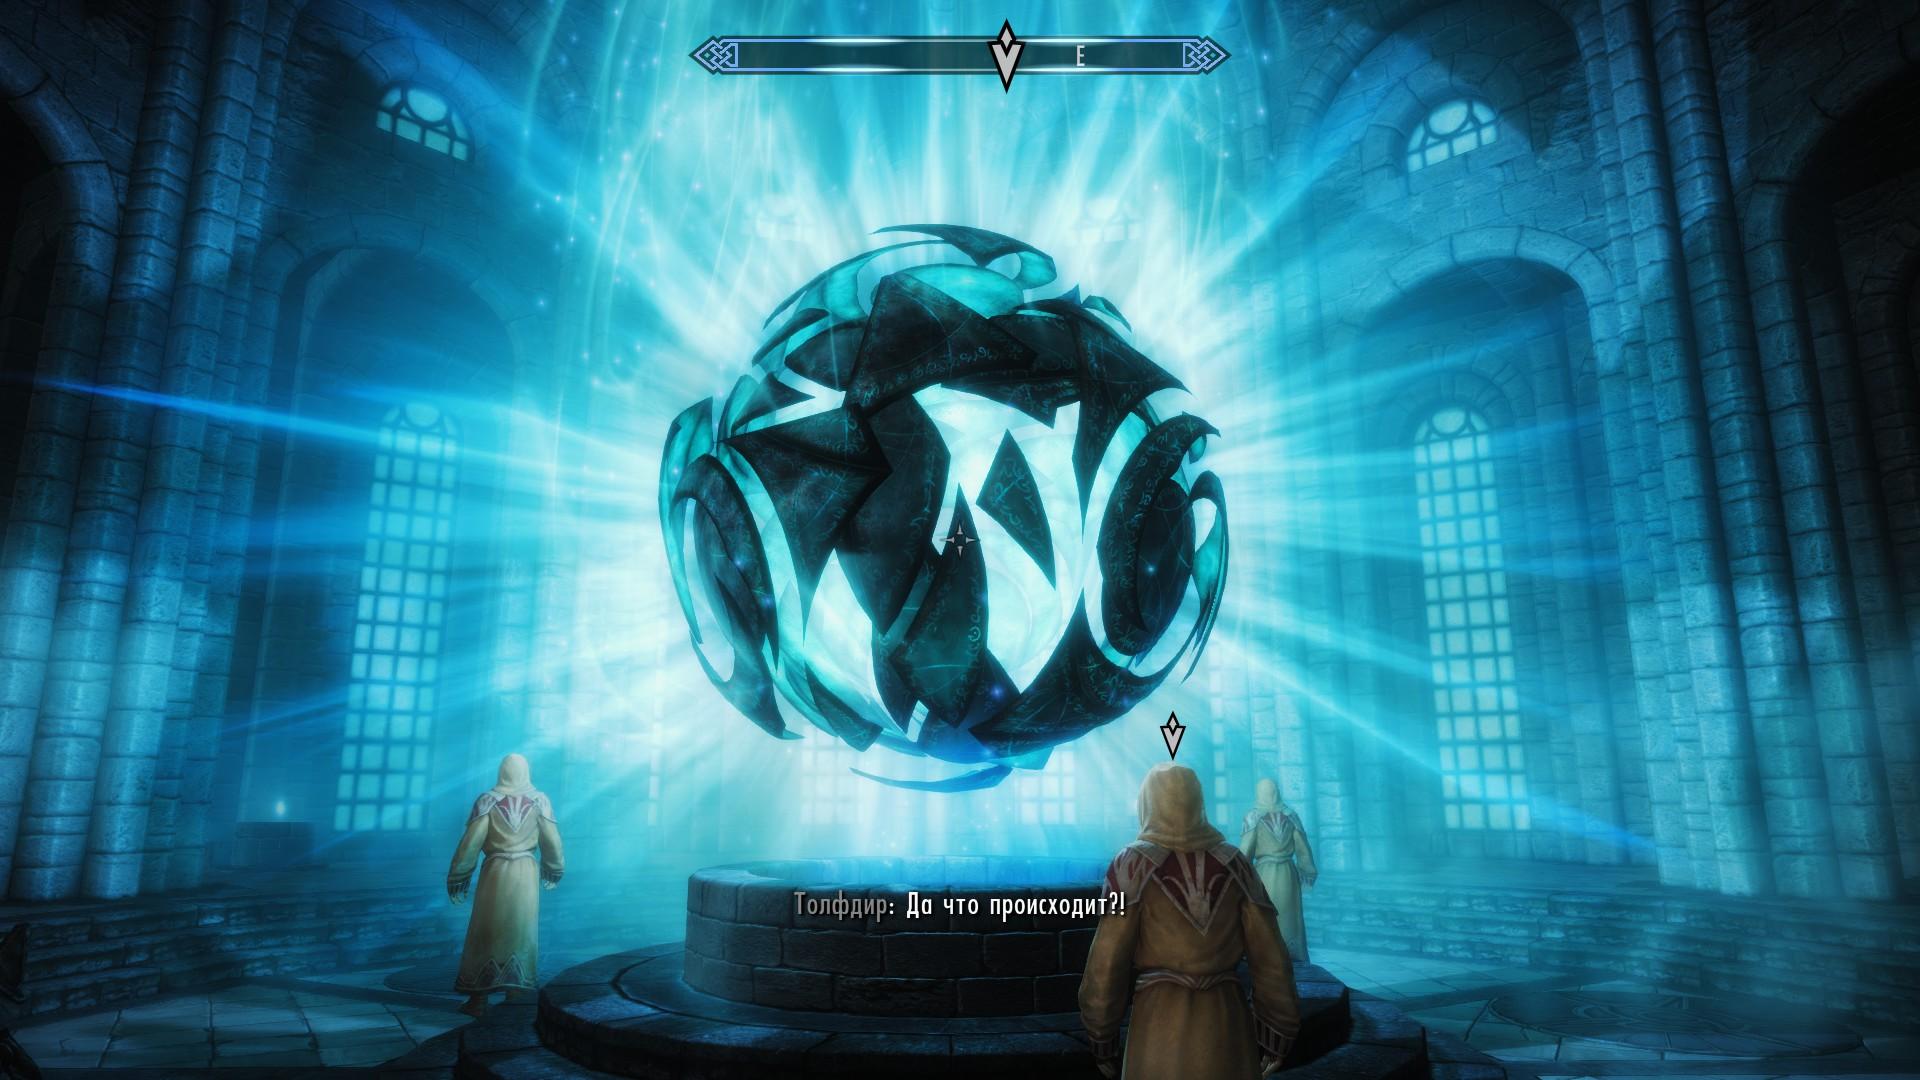 20180211154105_1.jpg - Elder Scrolls 5: Skyrim, the